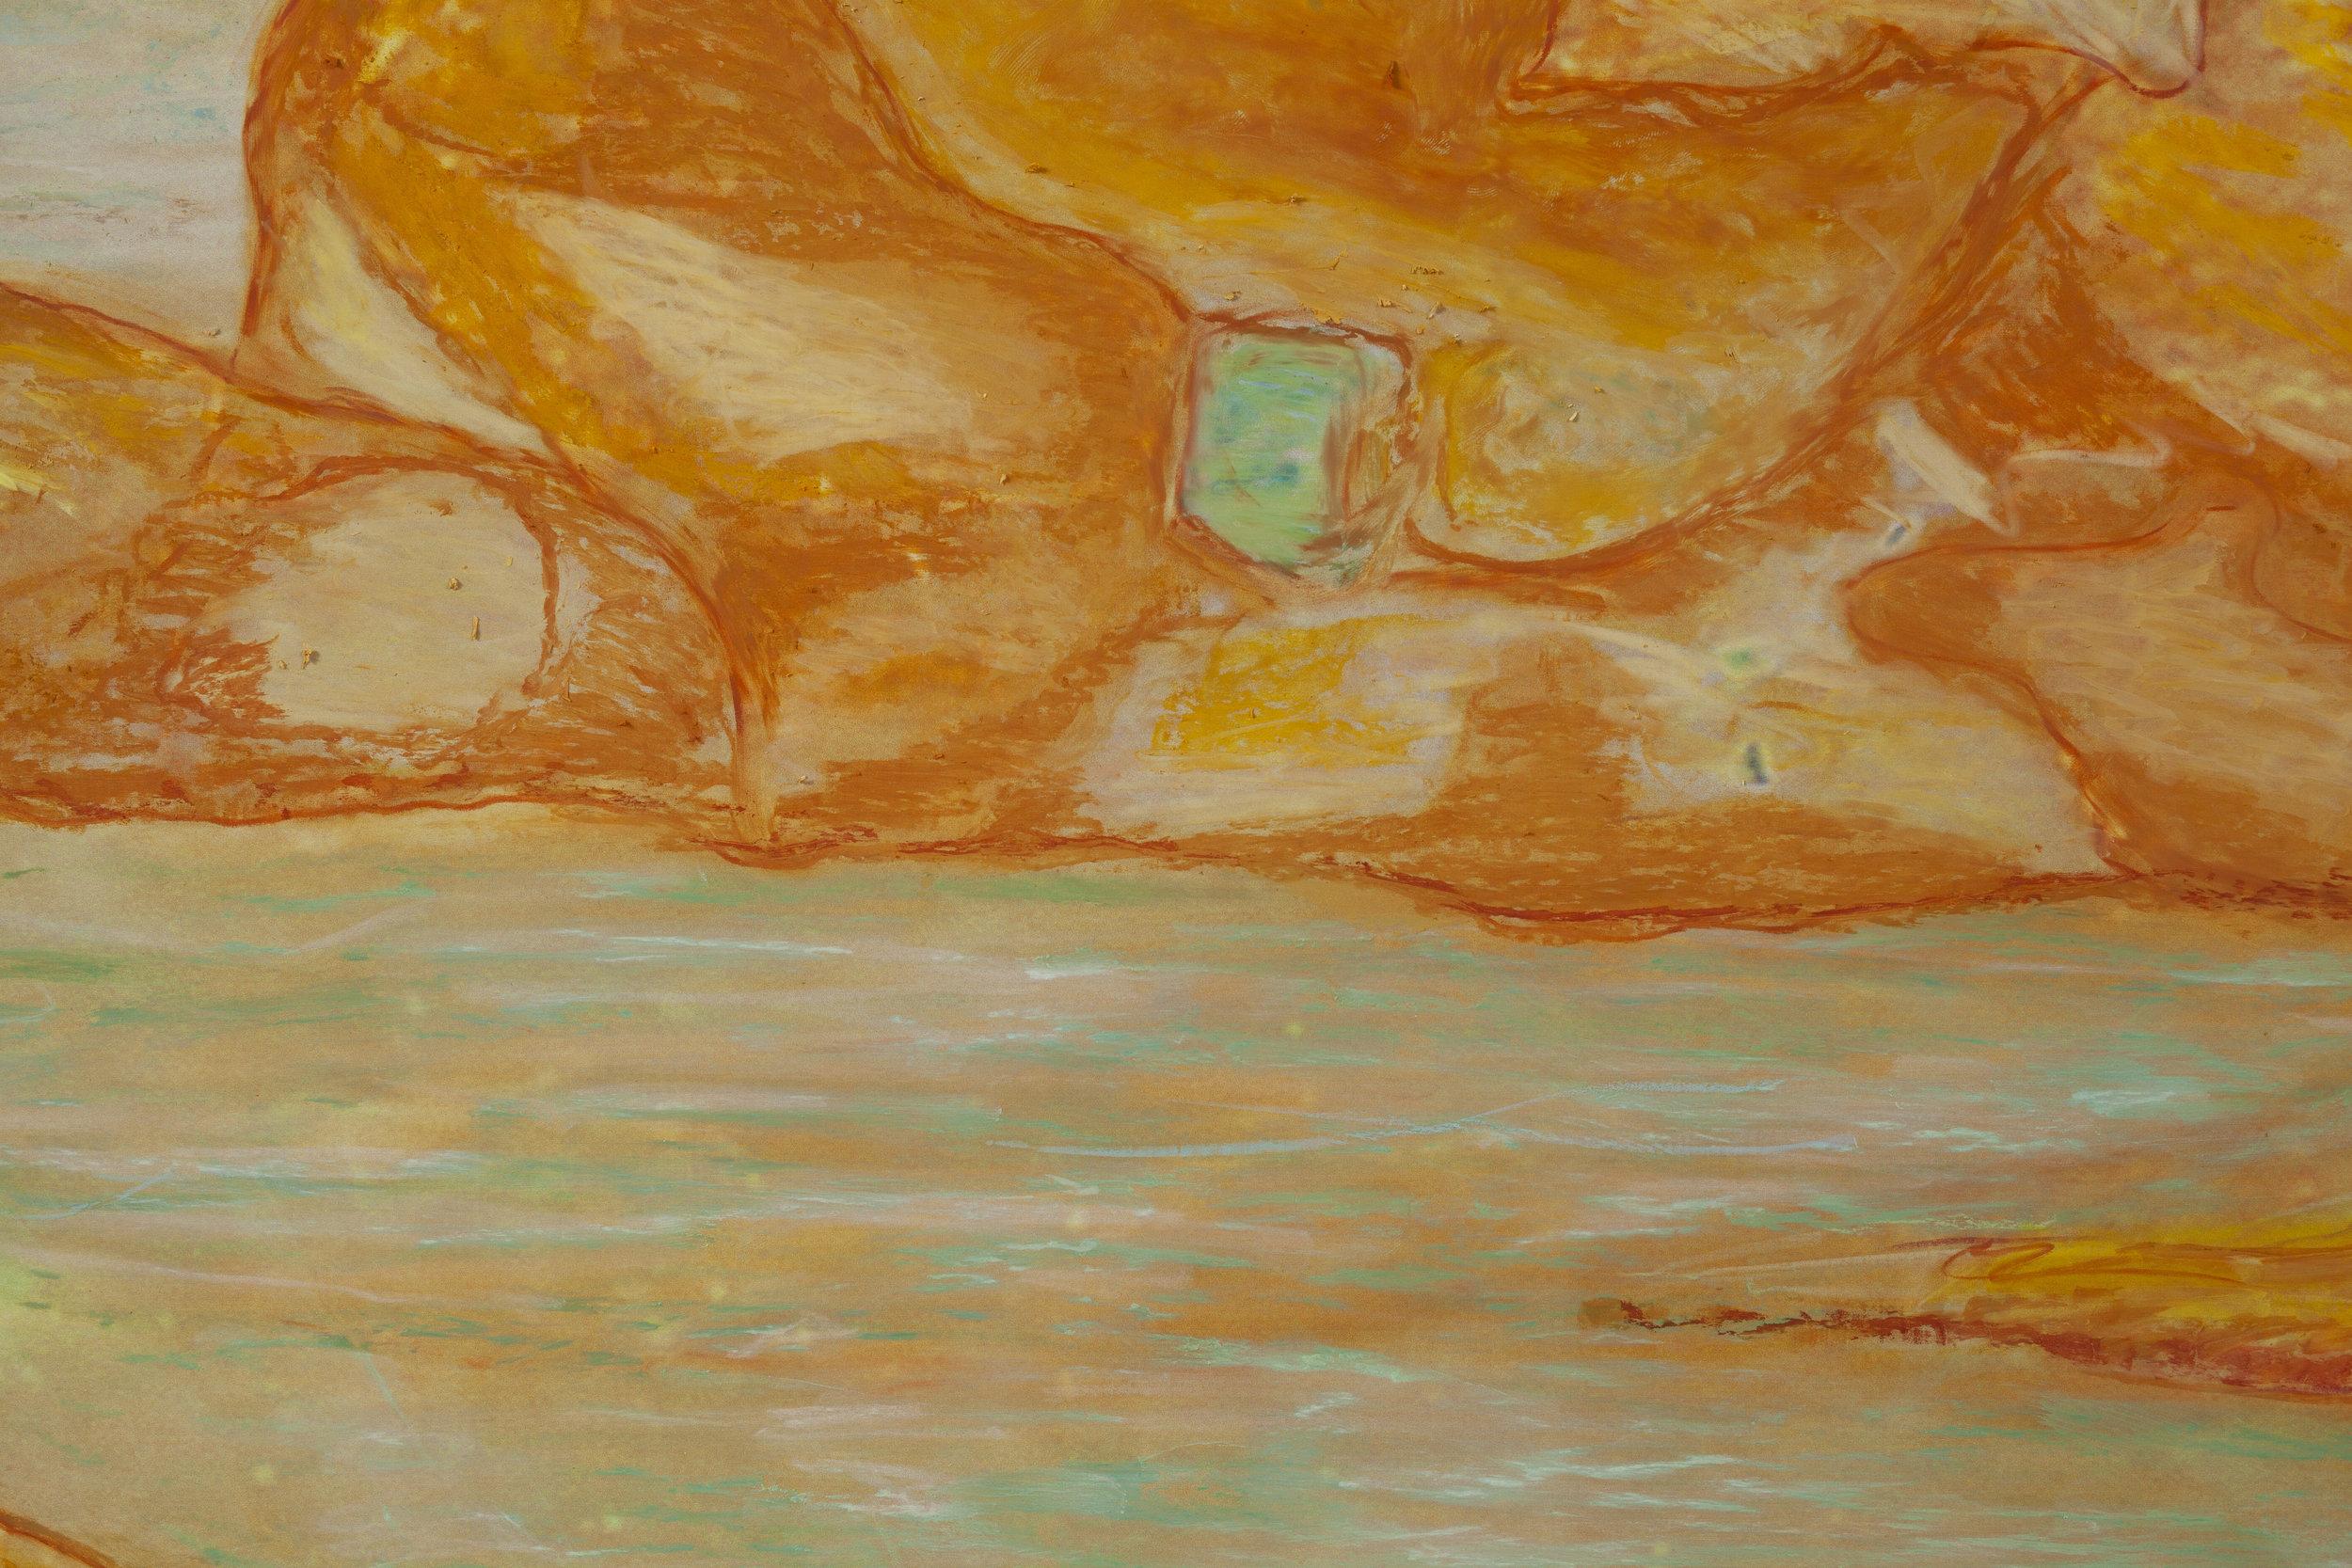 Beyond the Oecumene / Part XI,  2019  - Detail Wax pastels, UV-print on gold Alu-Dibond